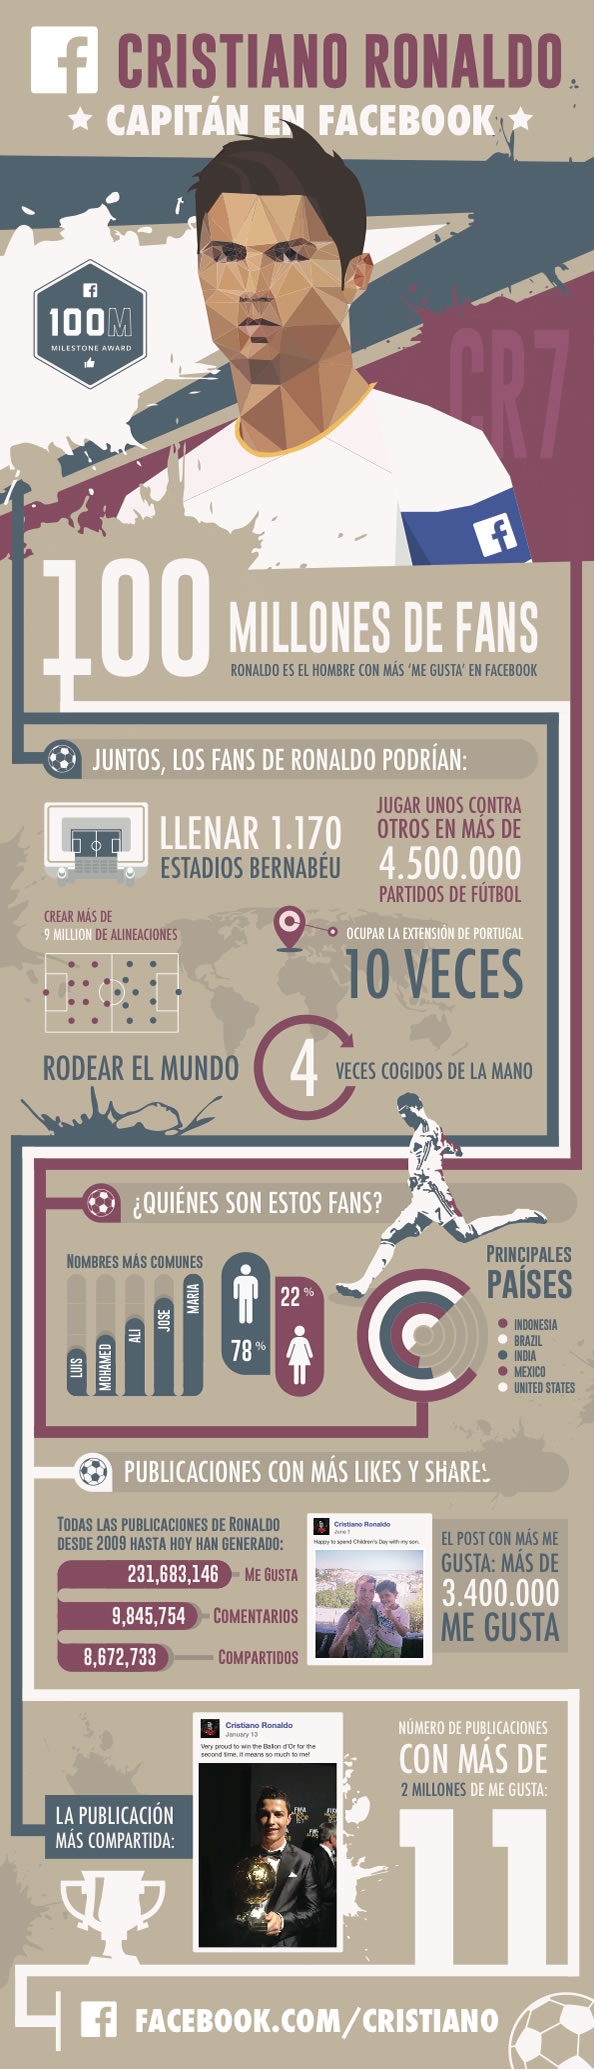 Cristiano Ronaldo se convirtió en el hombre más popular en Facebook - Infografia-Cristiano-Ronaldo-Facebook